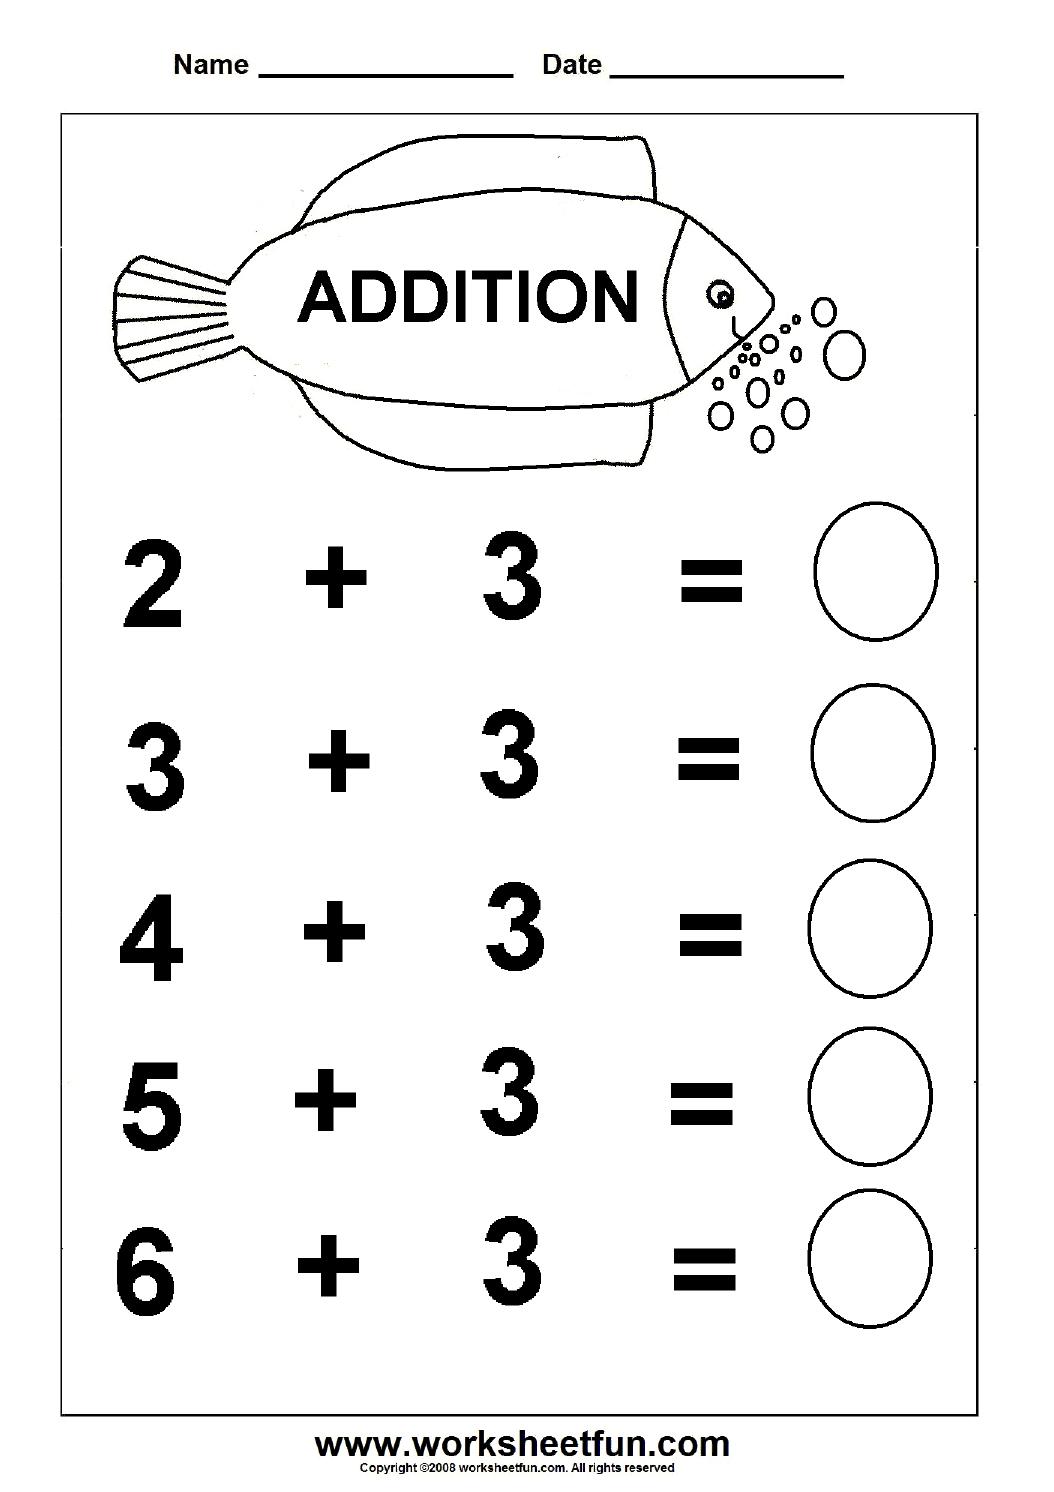 Beginner Addition – 6 Kindergarten Addition Worksheets / Free - Free Printable Preschool Addition Worksheets